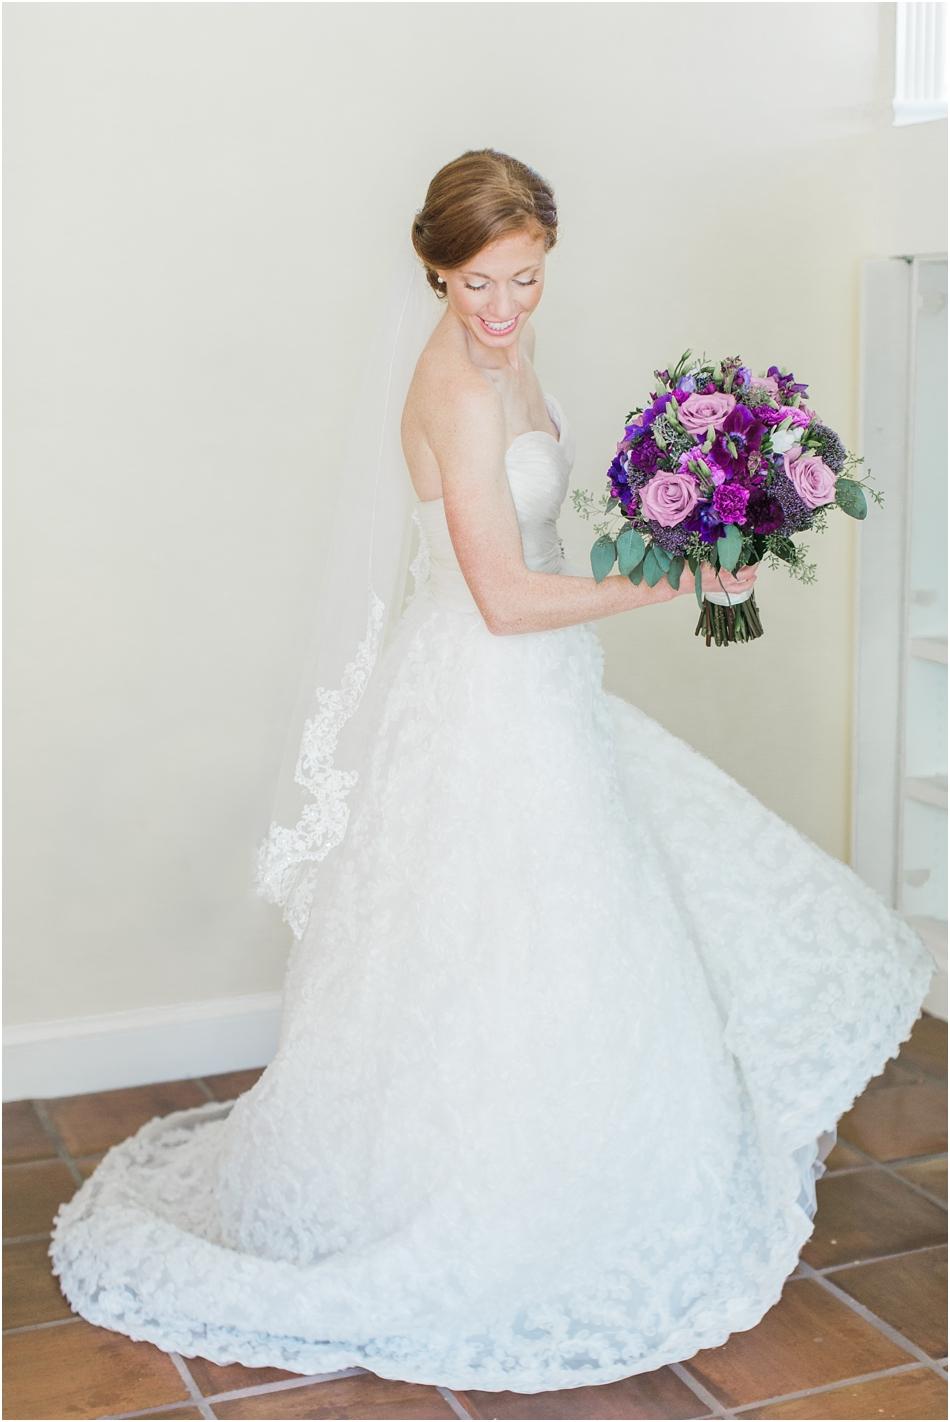 willowbend_megan_david_country_club_cape_cod_boston_new_england_wedding_photographer_Meredith_Jane_Photography_photo_0183.jpg